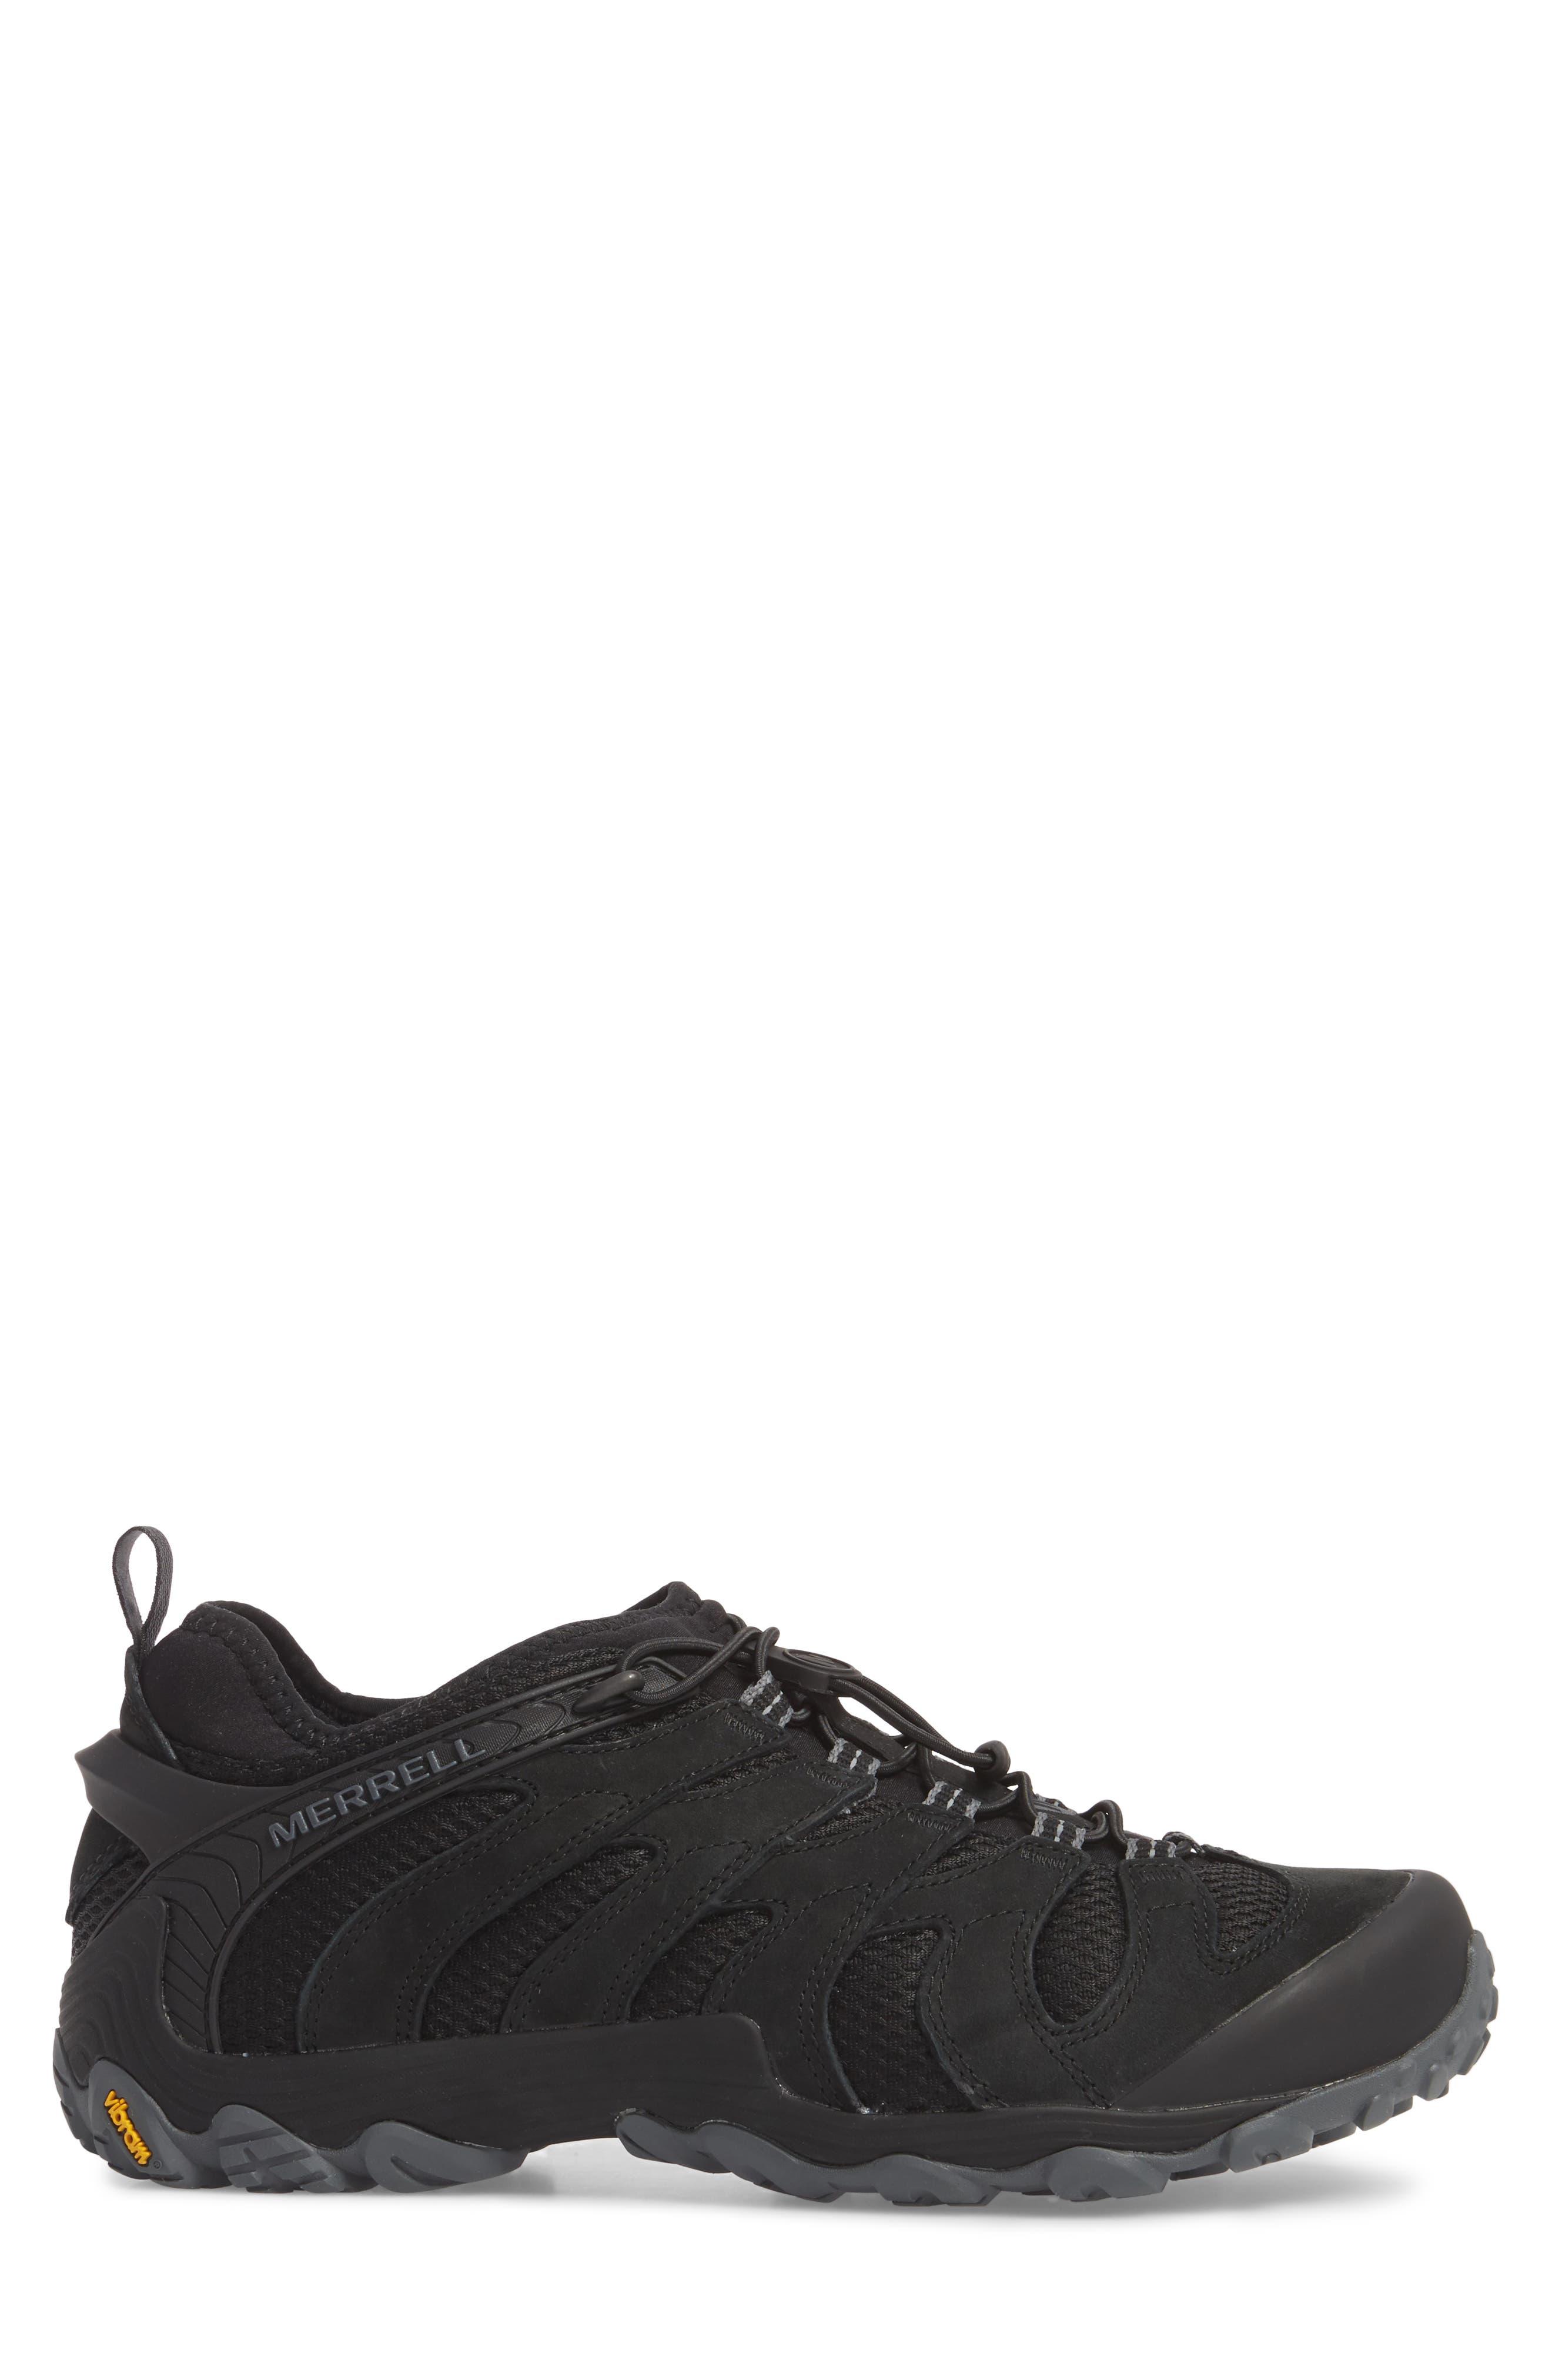 MERRELL, Chameleon 7 Stretch Hiking Shoe, Alternate thumbnail 3, color, BLACK